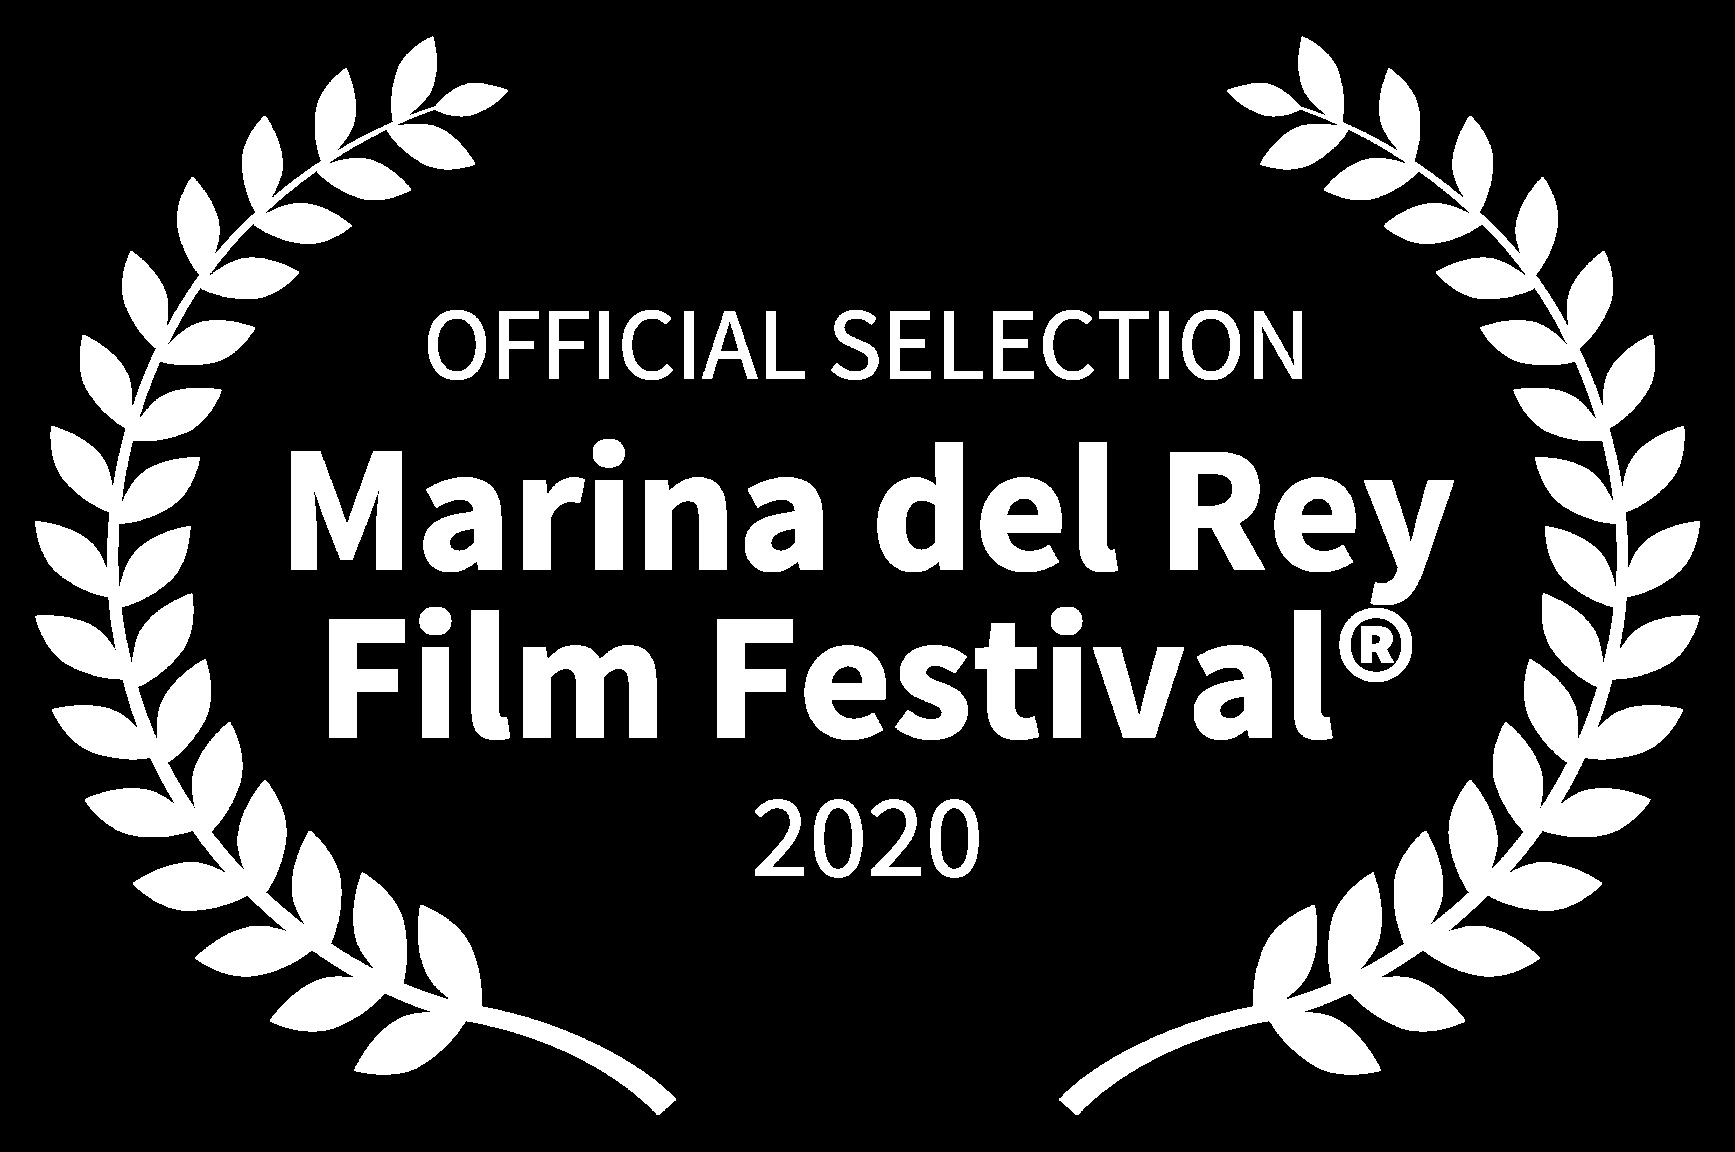 OFFICIAL-SELECTION-Marina-del-Rey-Film-Festival-2020